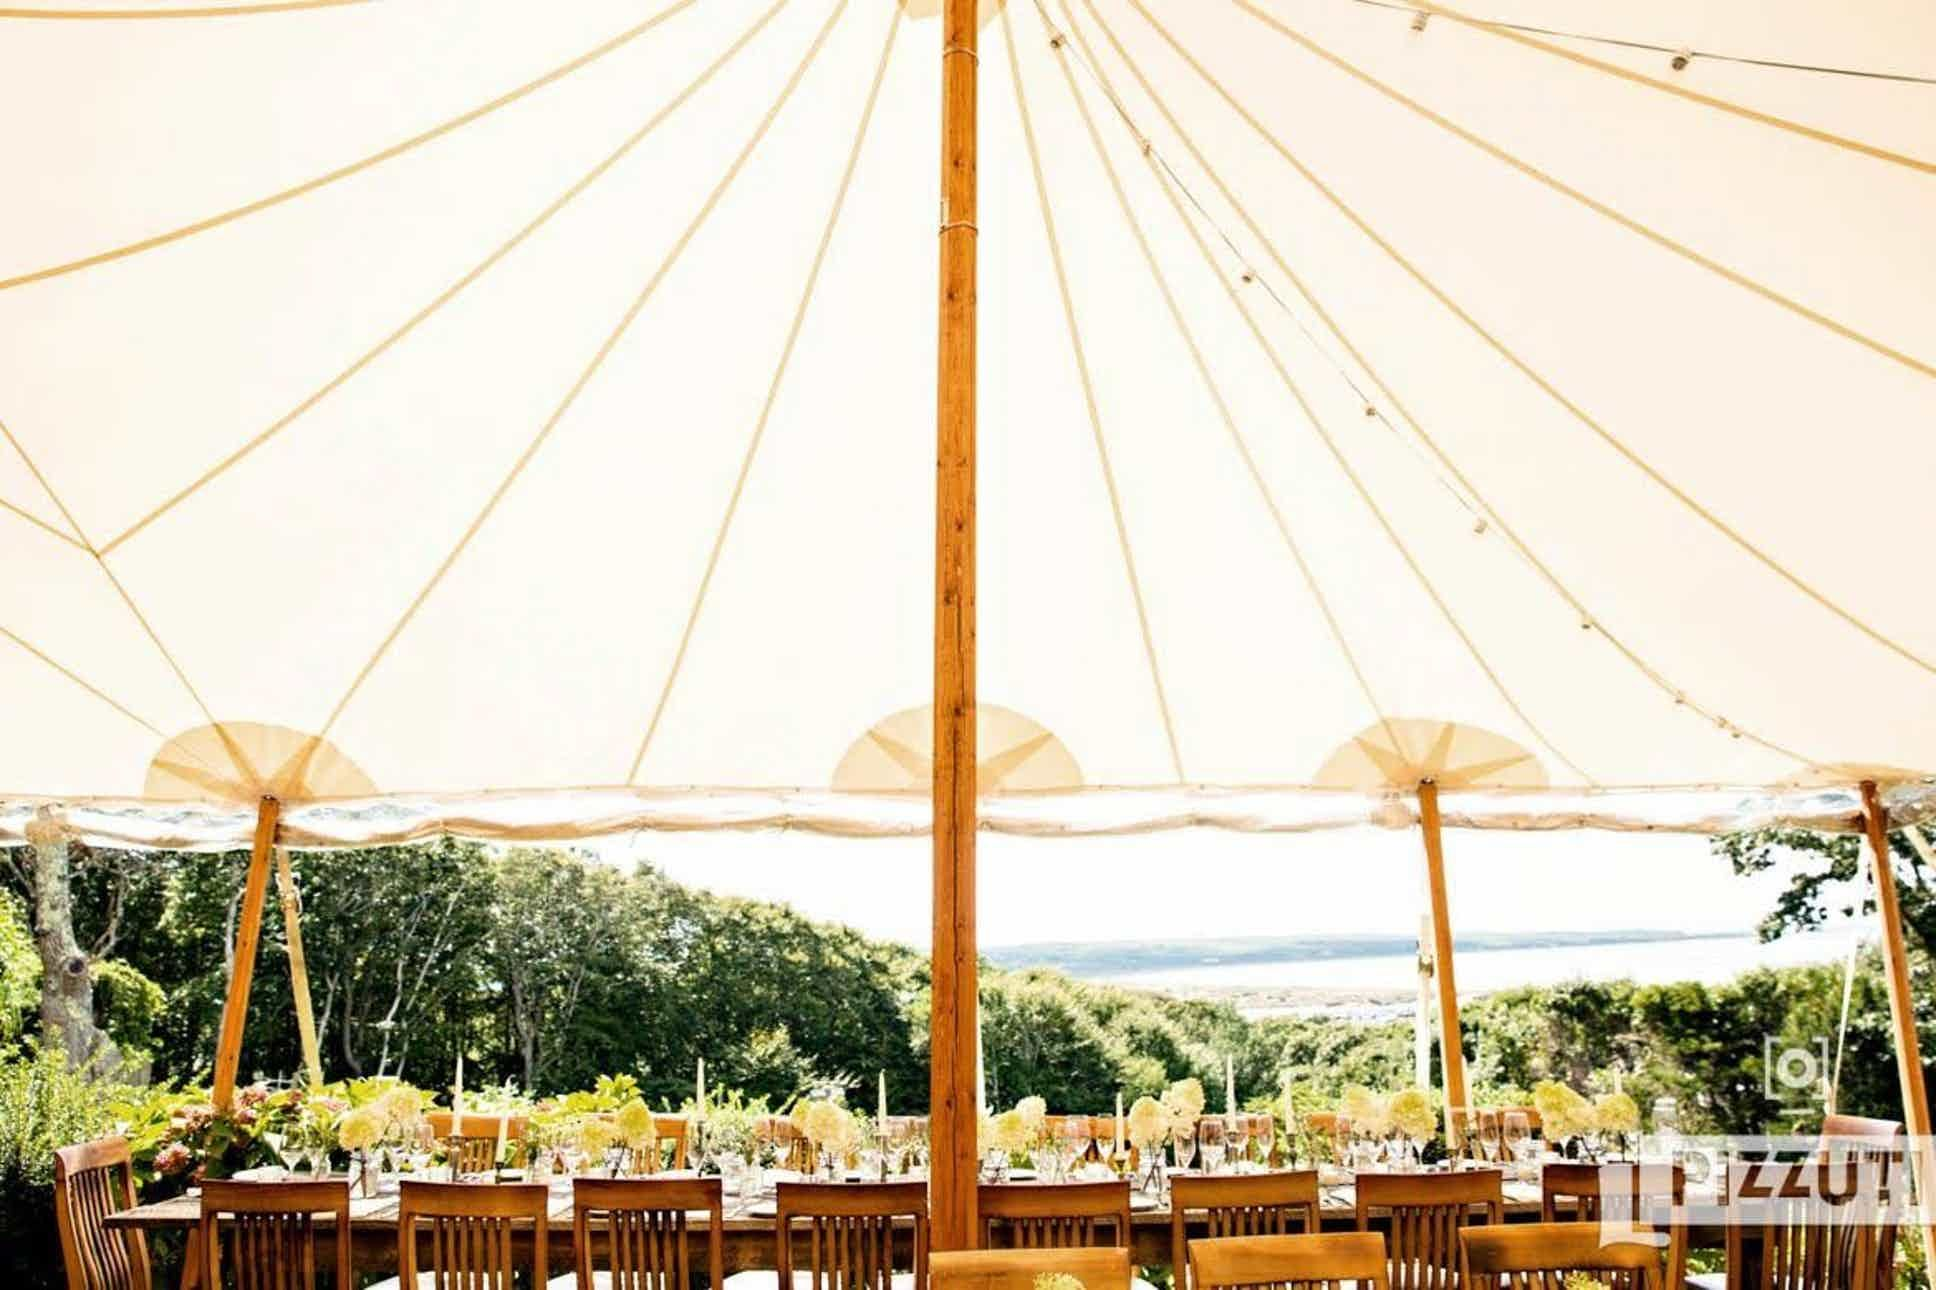 Beach plum inn and restaurant weddings cape cod wedding